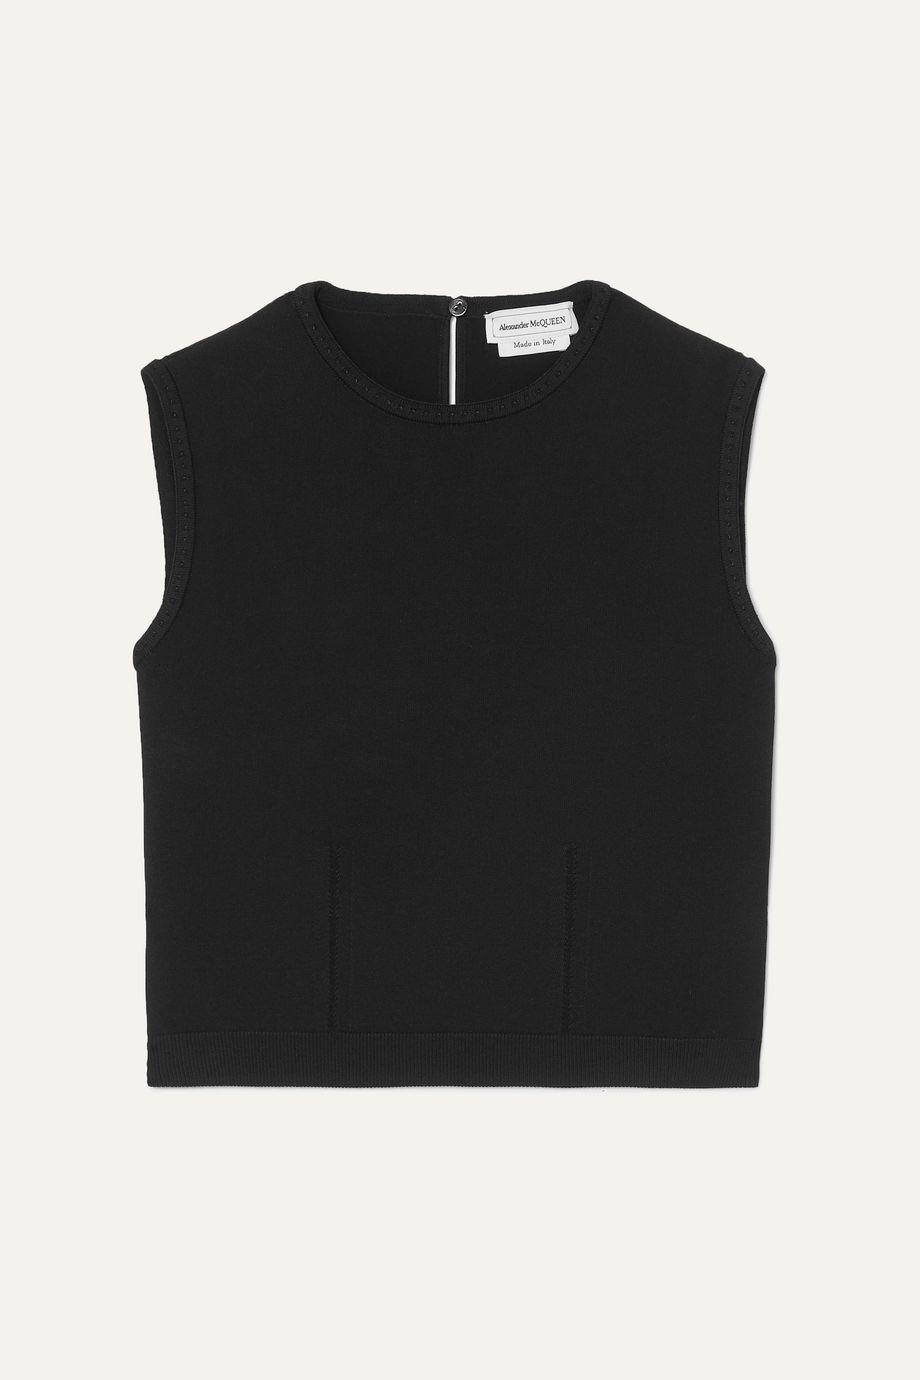 Alexander McQueen Cropped stretch-knit tank